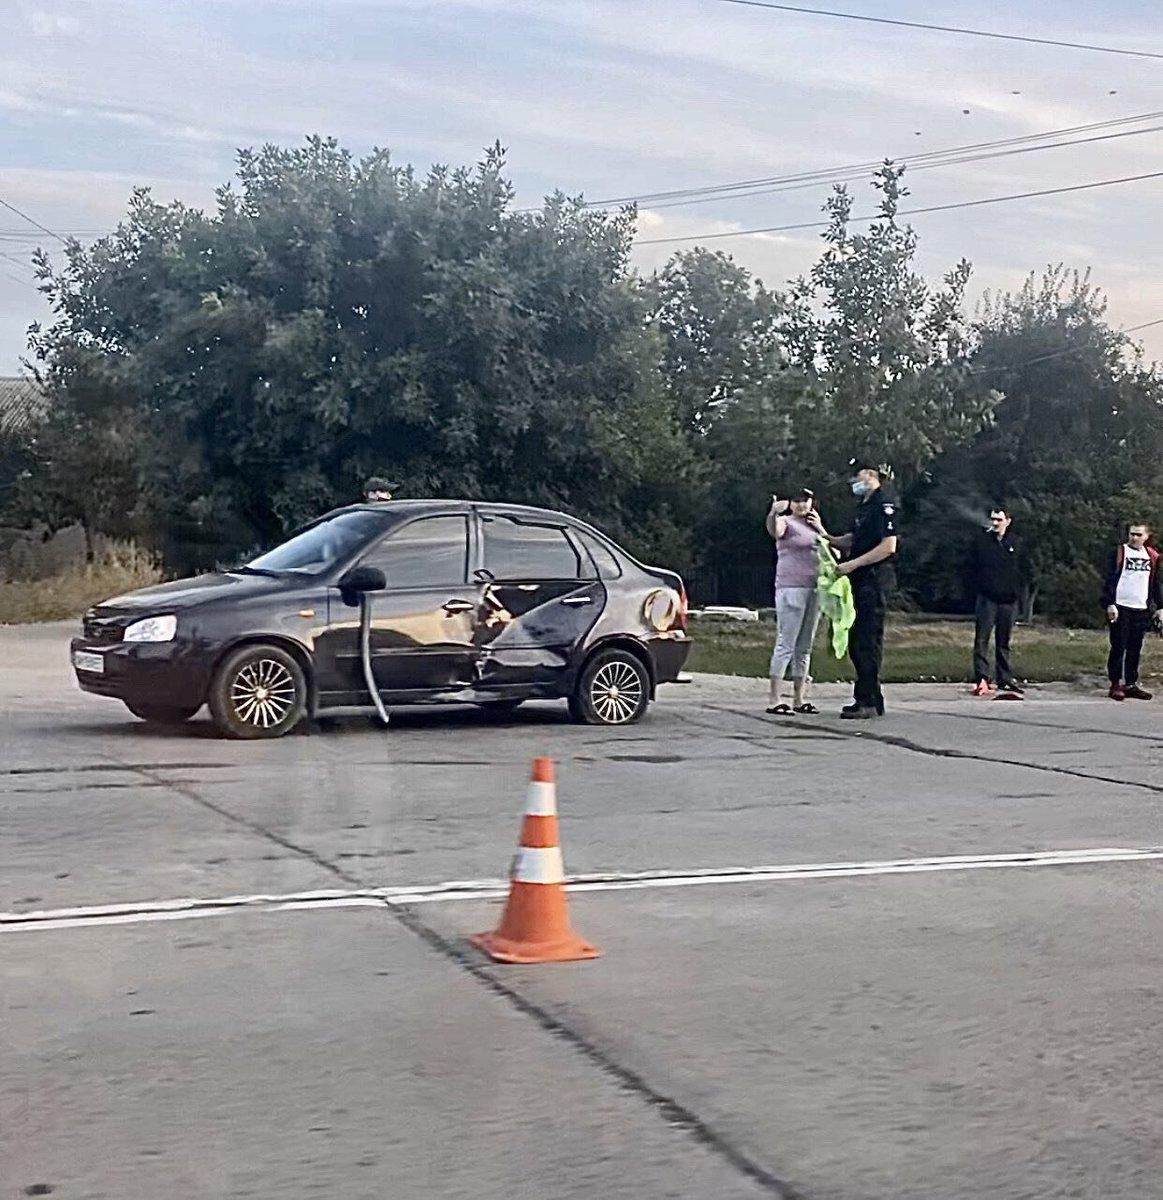 В аварии на Таганрогской пострадал мотоциклист, - ФОТО   https://t.co/jhREryvVVi https://t.co/wy9ZQm7U6a